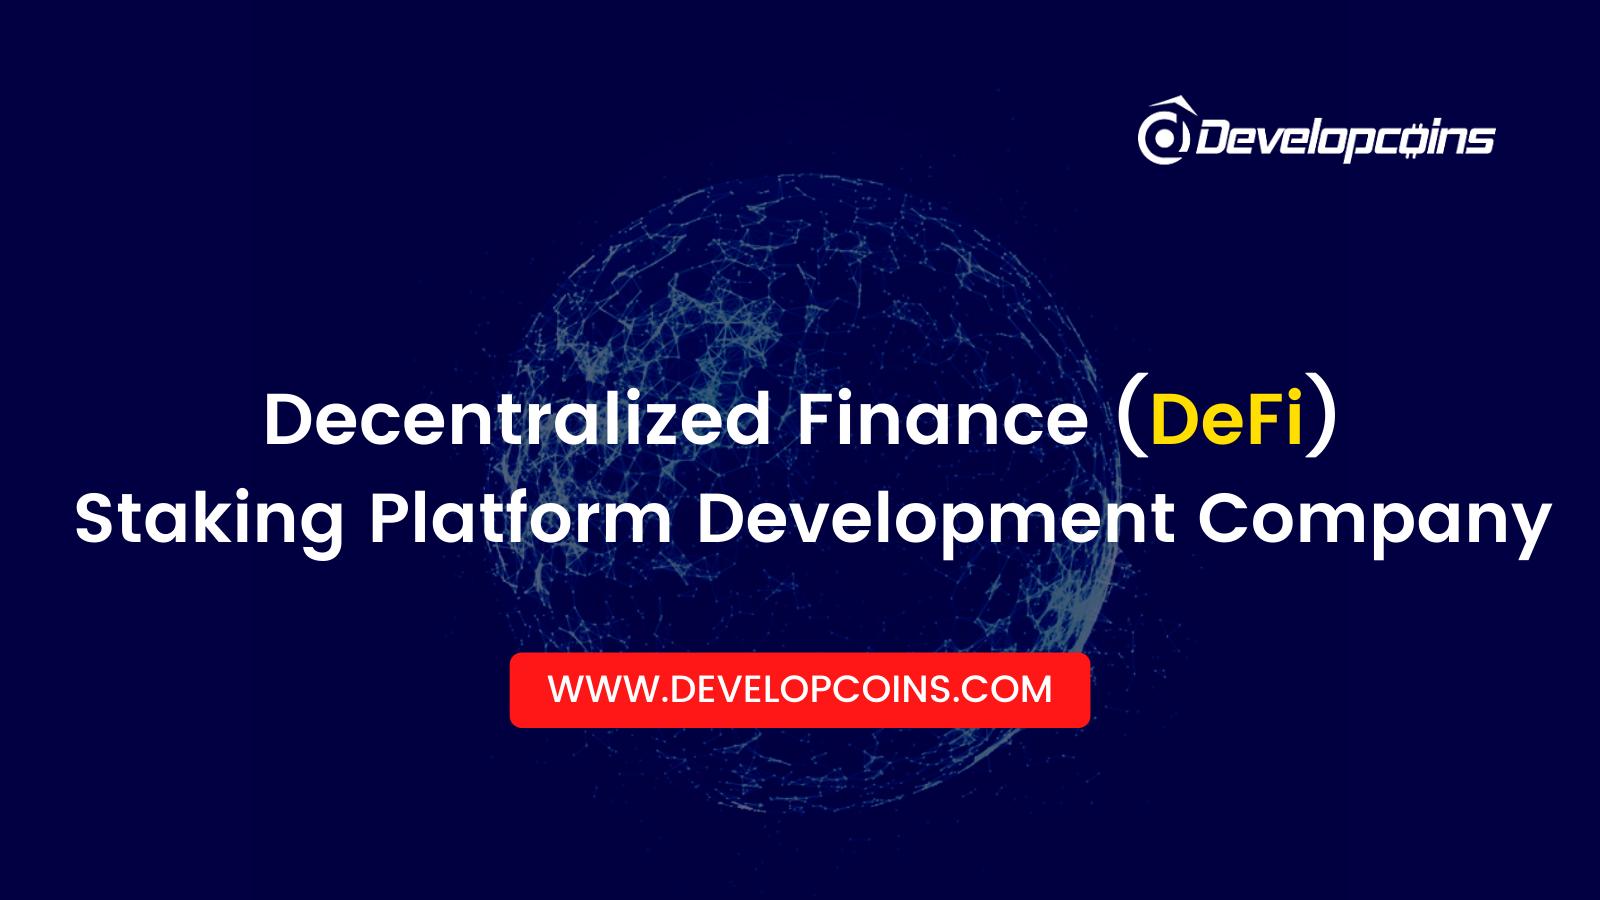 Introducing DeFi Staking Platform Development - An Exclusive DeFi Solution